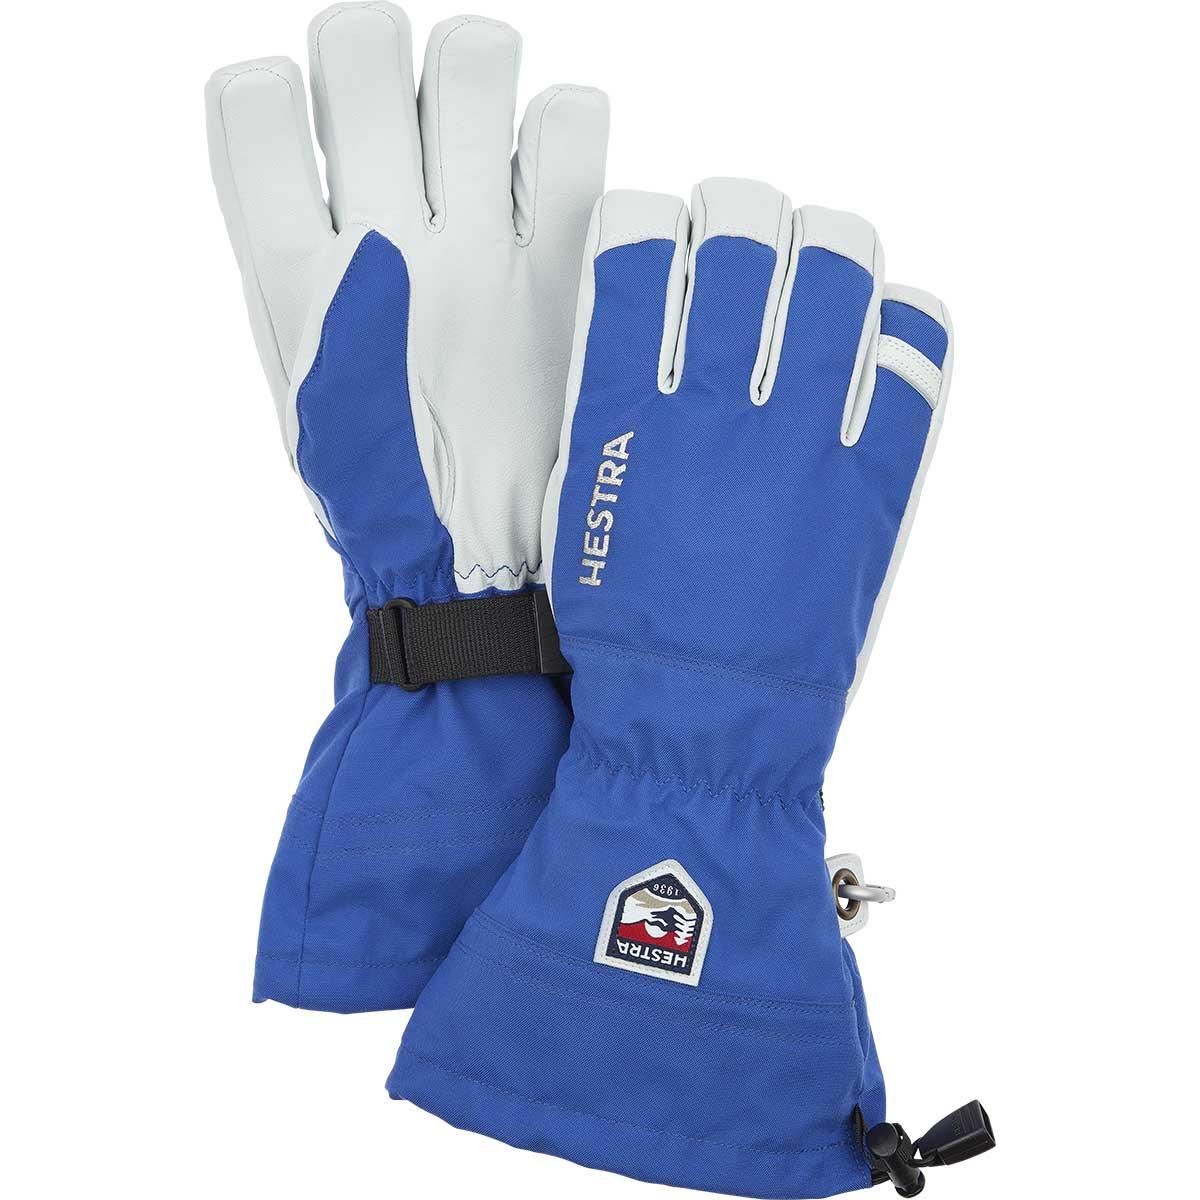 Hestra Army Leather Heli Glove